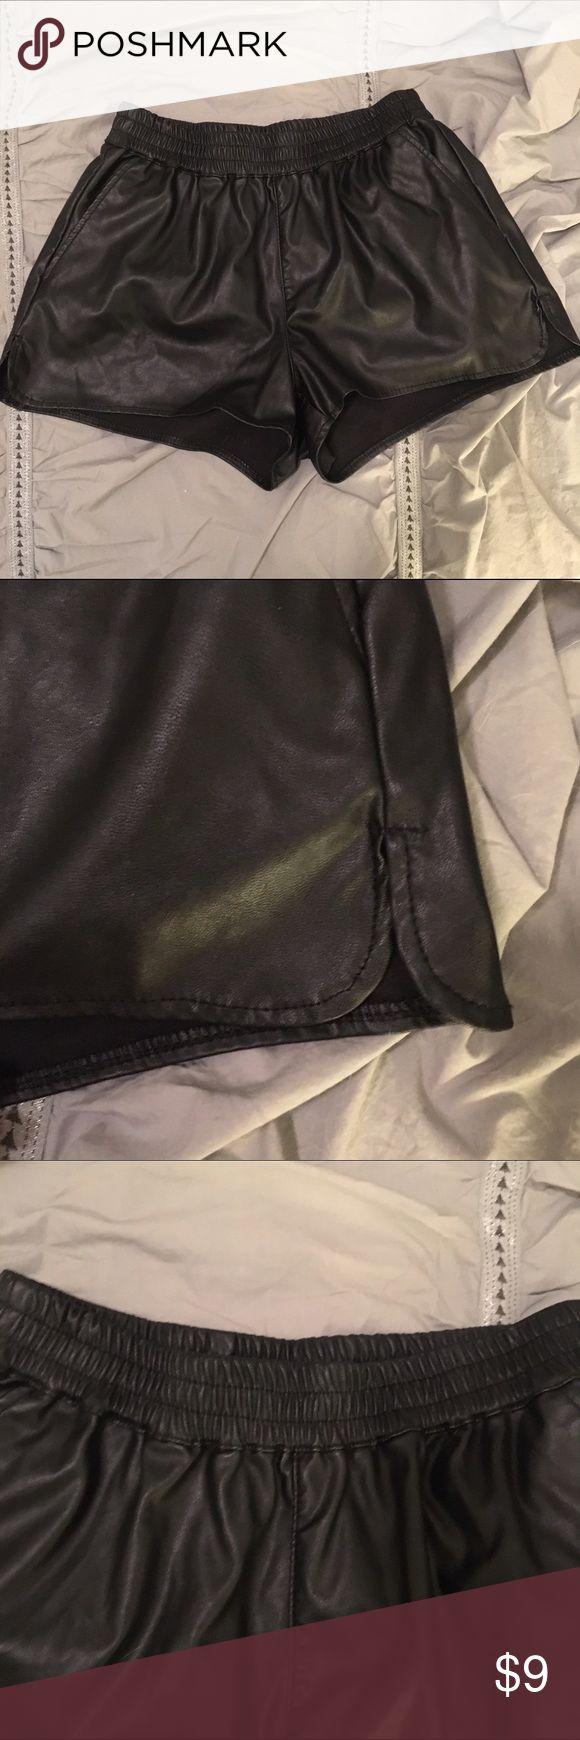 H&M black faux lthr shorts - Sz 2 Black mini shorts with dolphin hem.  Faux leather, elastic waistband.  H&M size 2 H&M Shorts